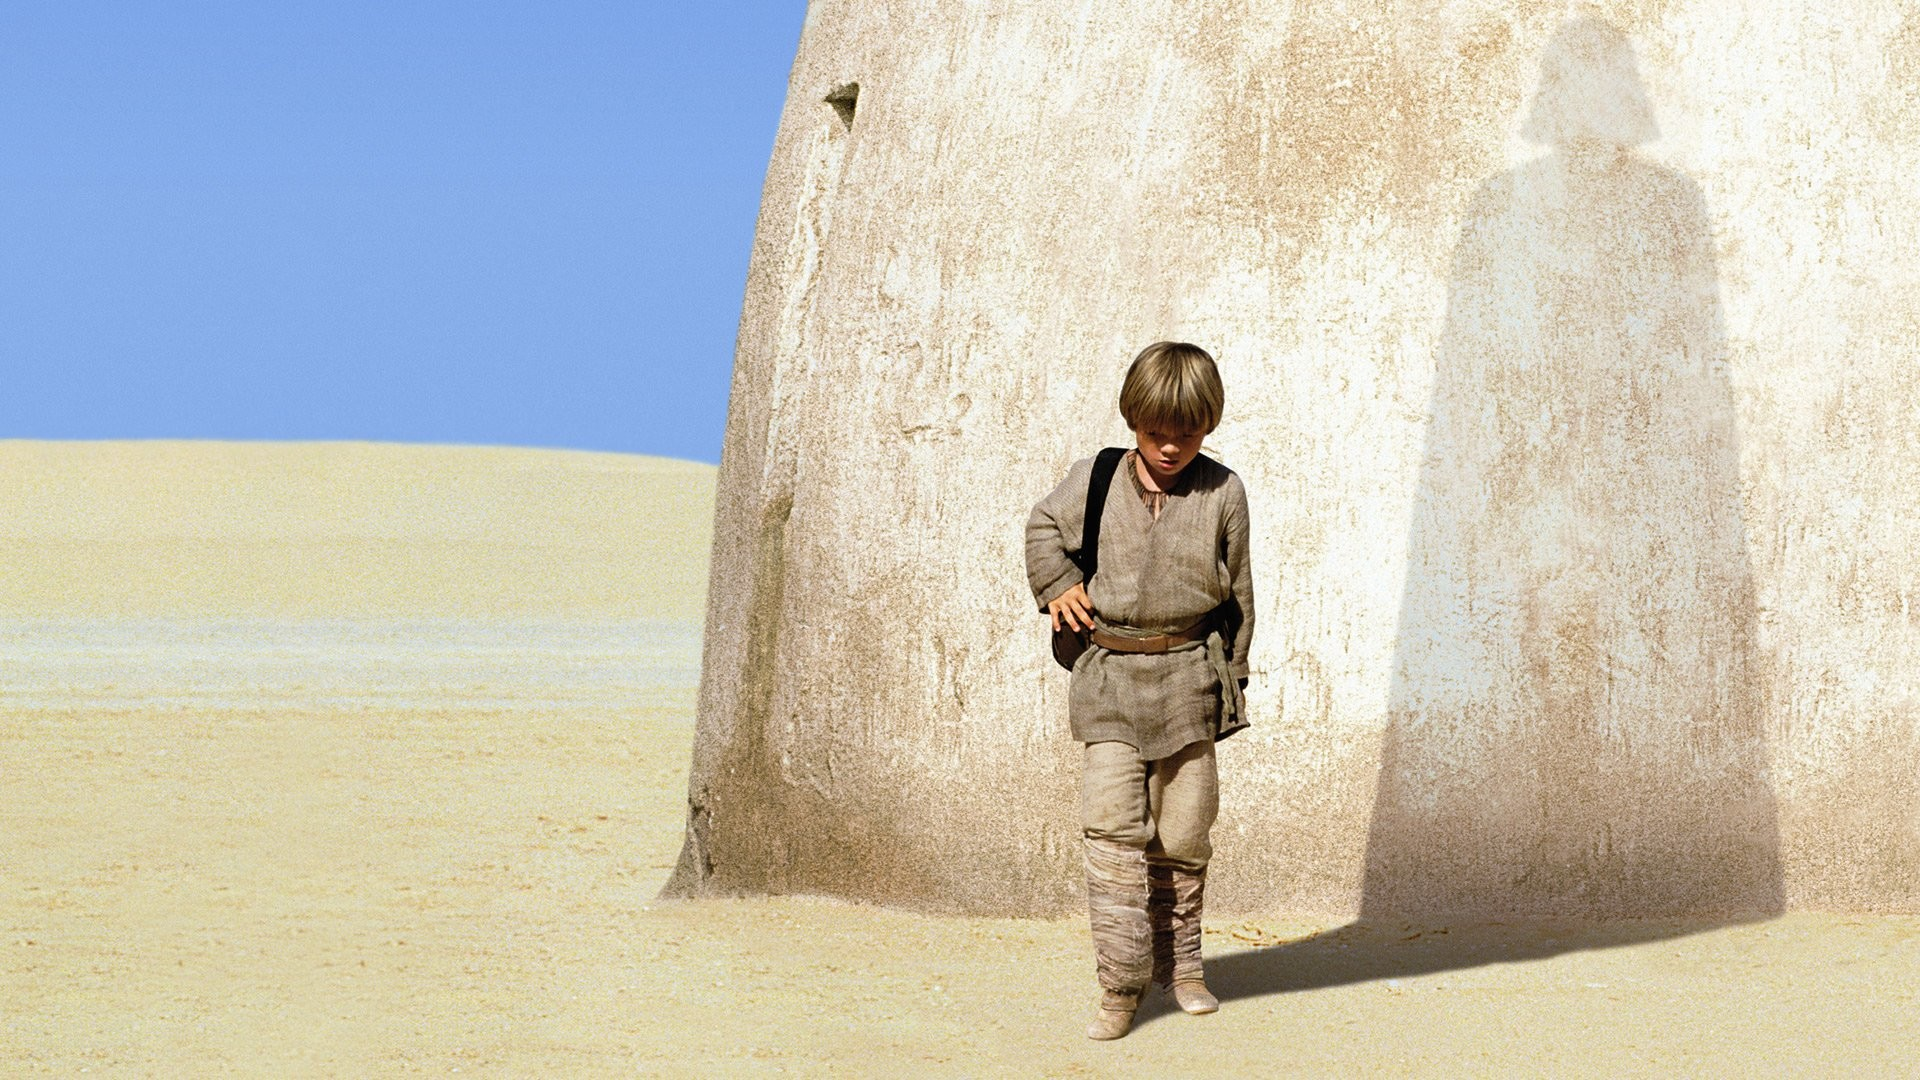 Anakin Skywalker Wallpaper ·①